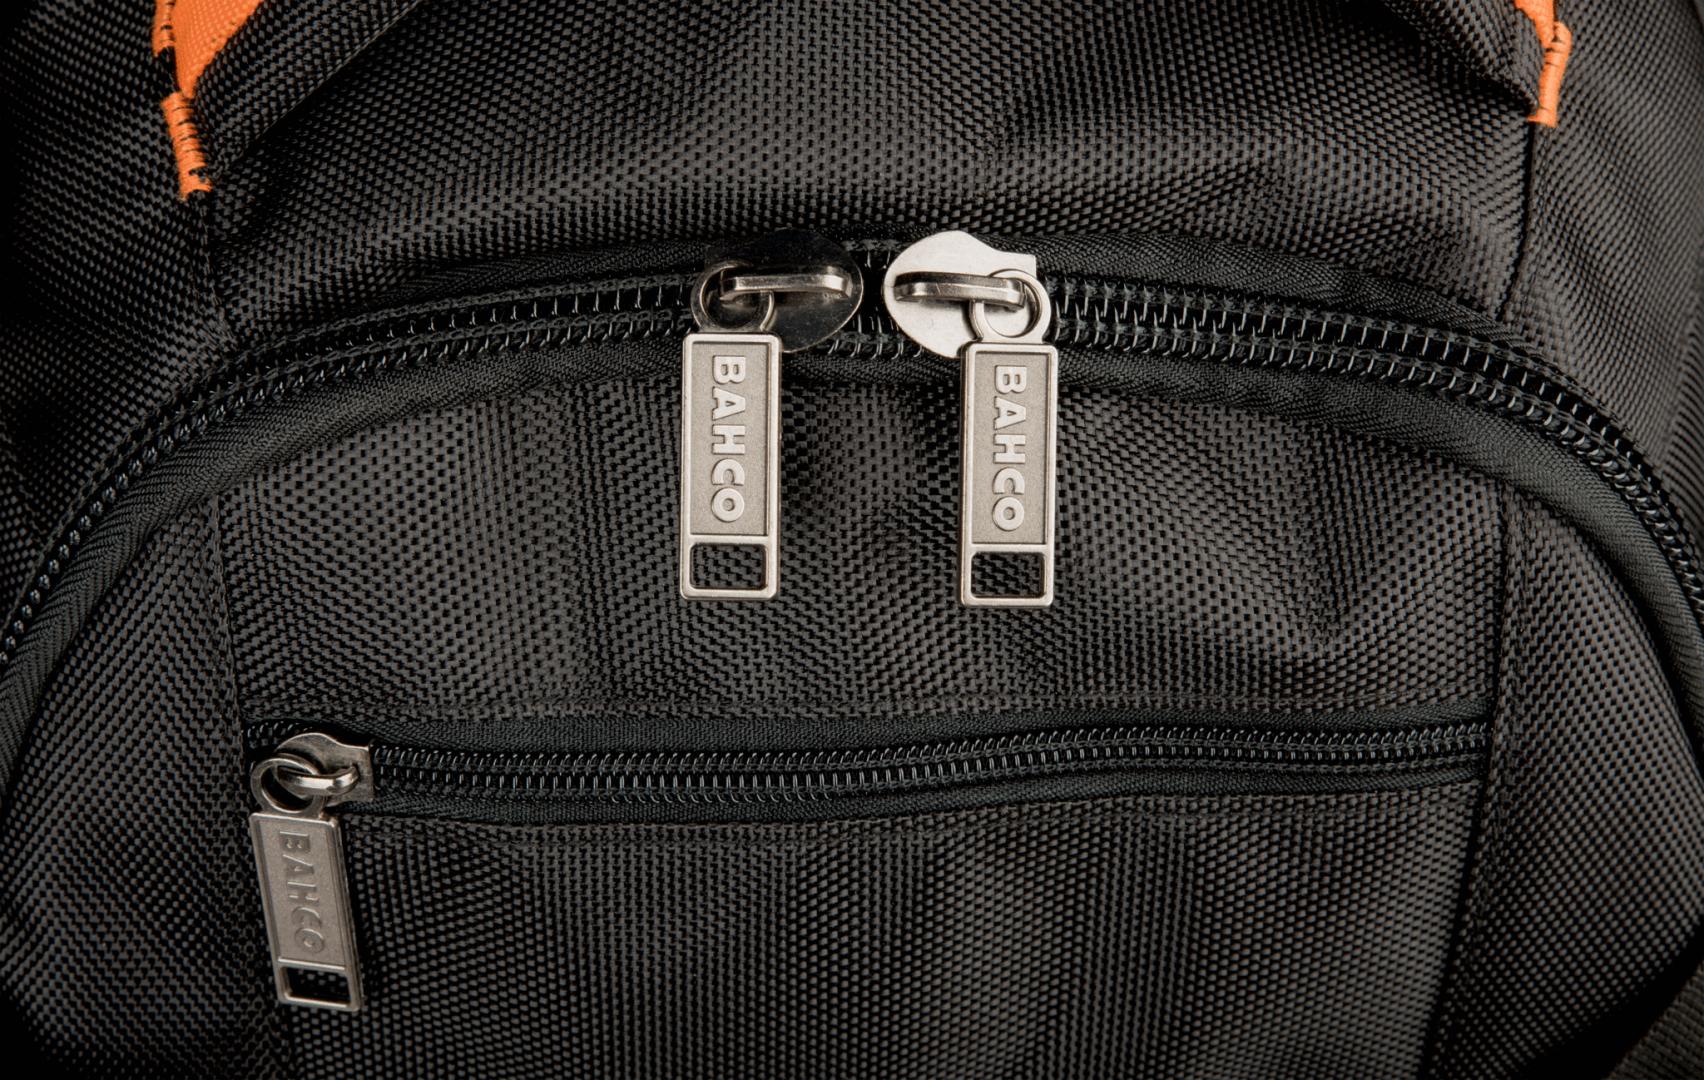 Plecak monterski z twardym dnem Bahco (nr kat. 4750FB8)